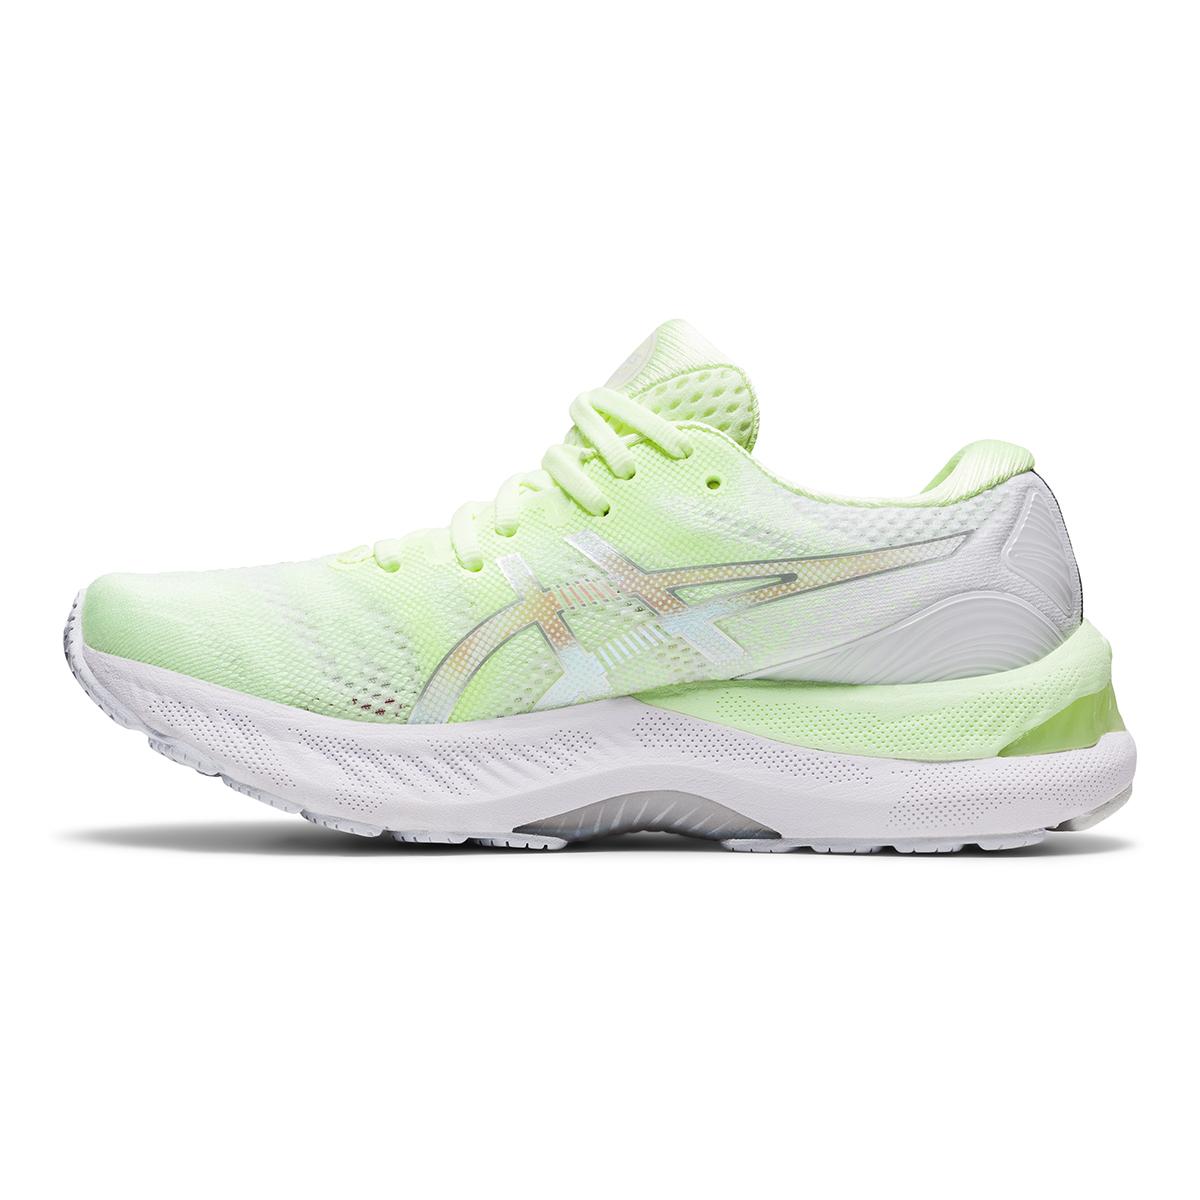 Women's Asics Gel-Nimbus 23 Running Shoe - Color: Illuminate Yellow - Size: 5 - Width: Regular, Illuminate Yellow, large, image 2